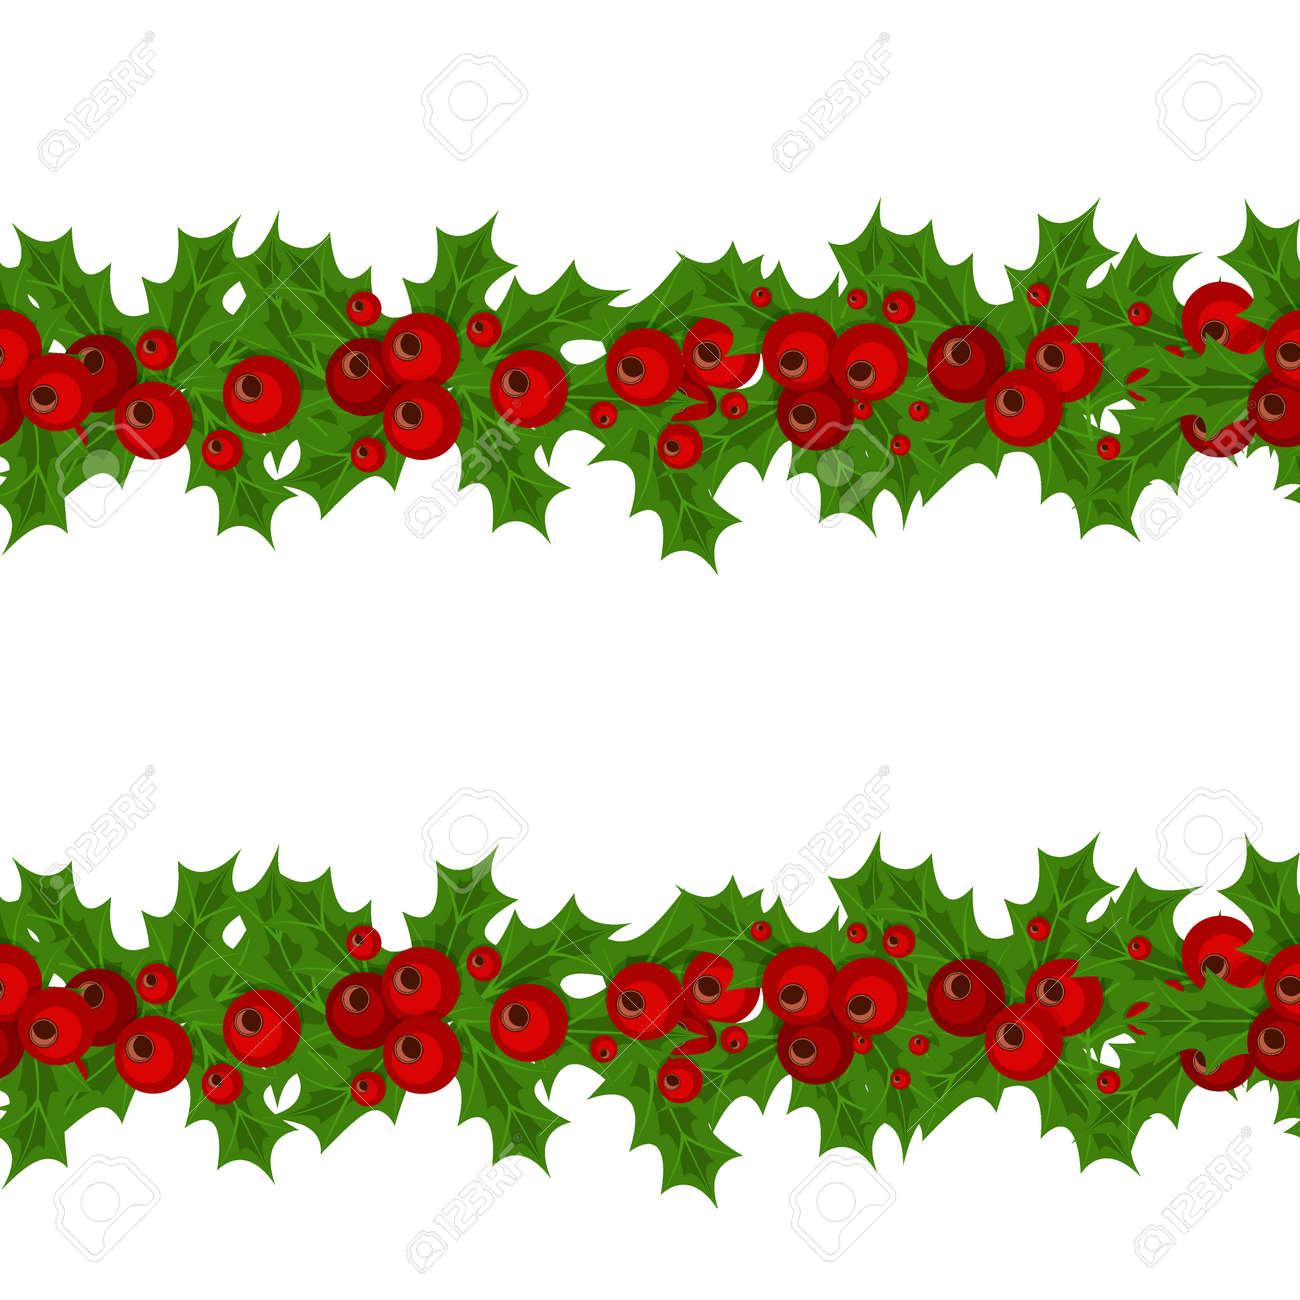 Christmas Garlands.Green Christmas Garlands Of Holly And Mistletoe Horizontal Seamless